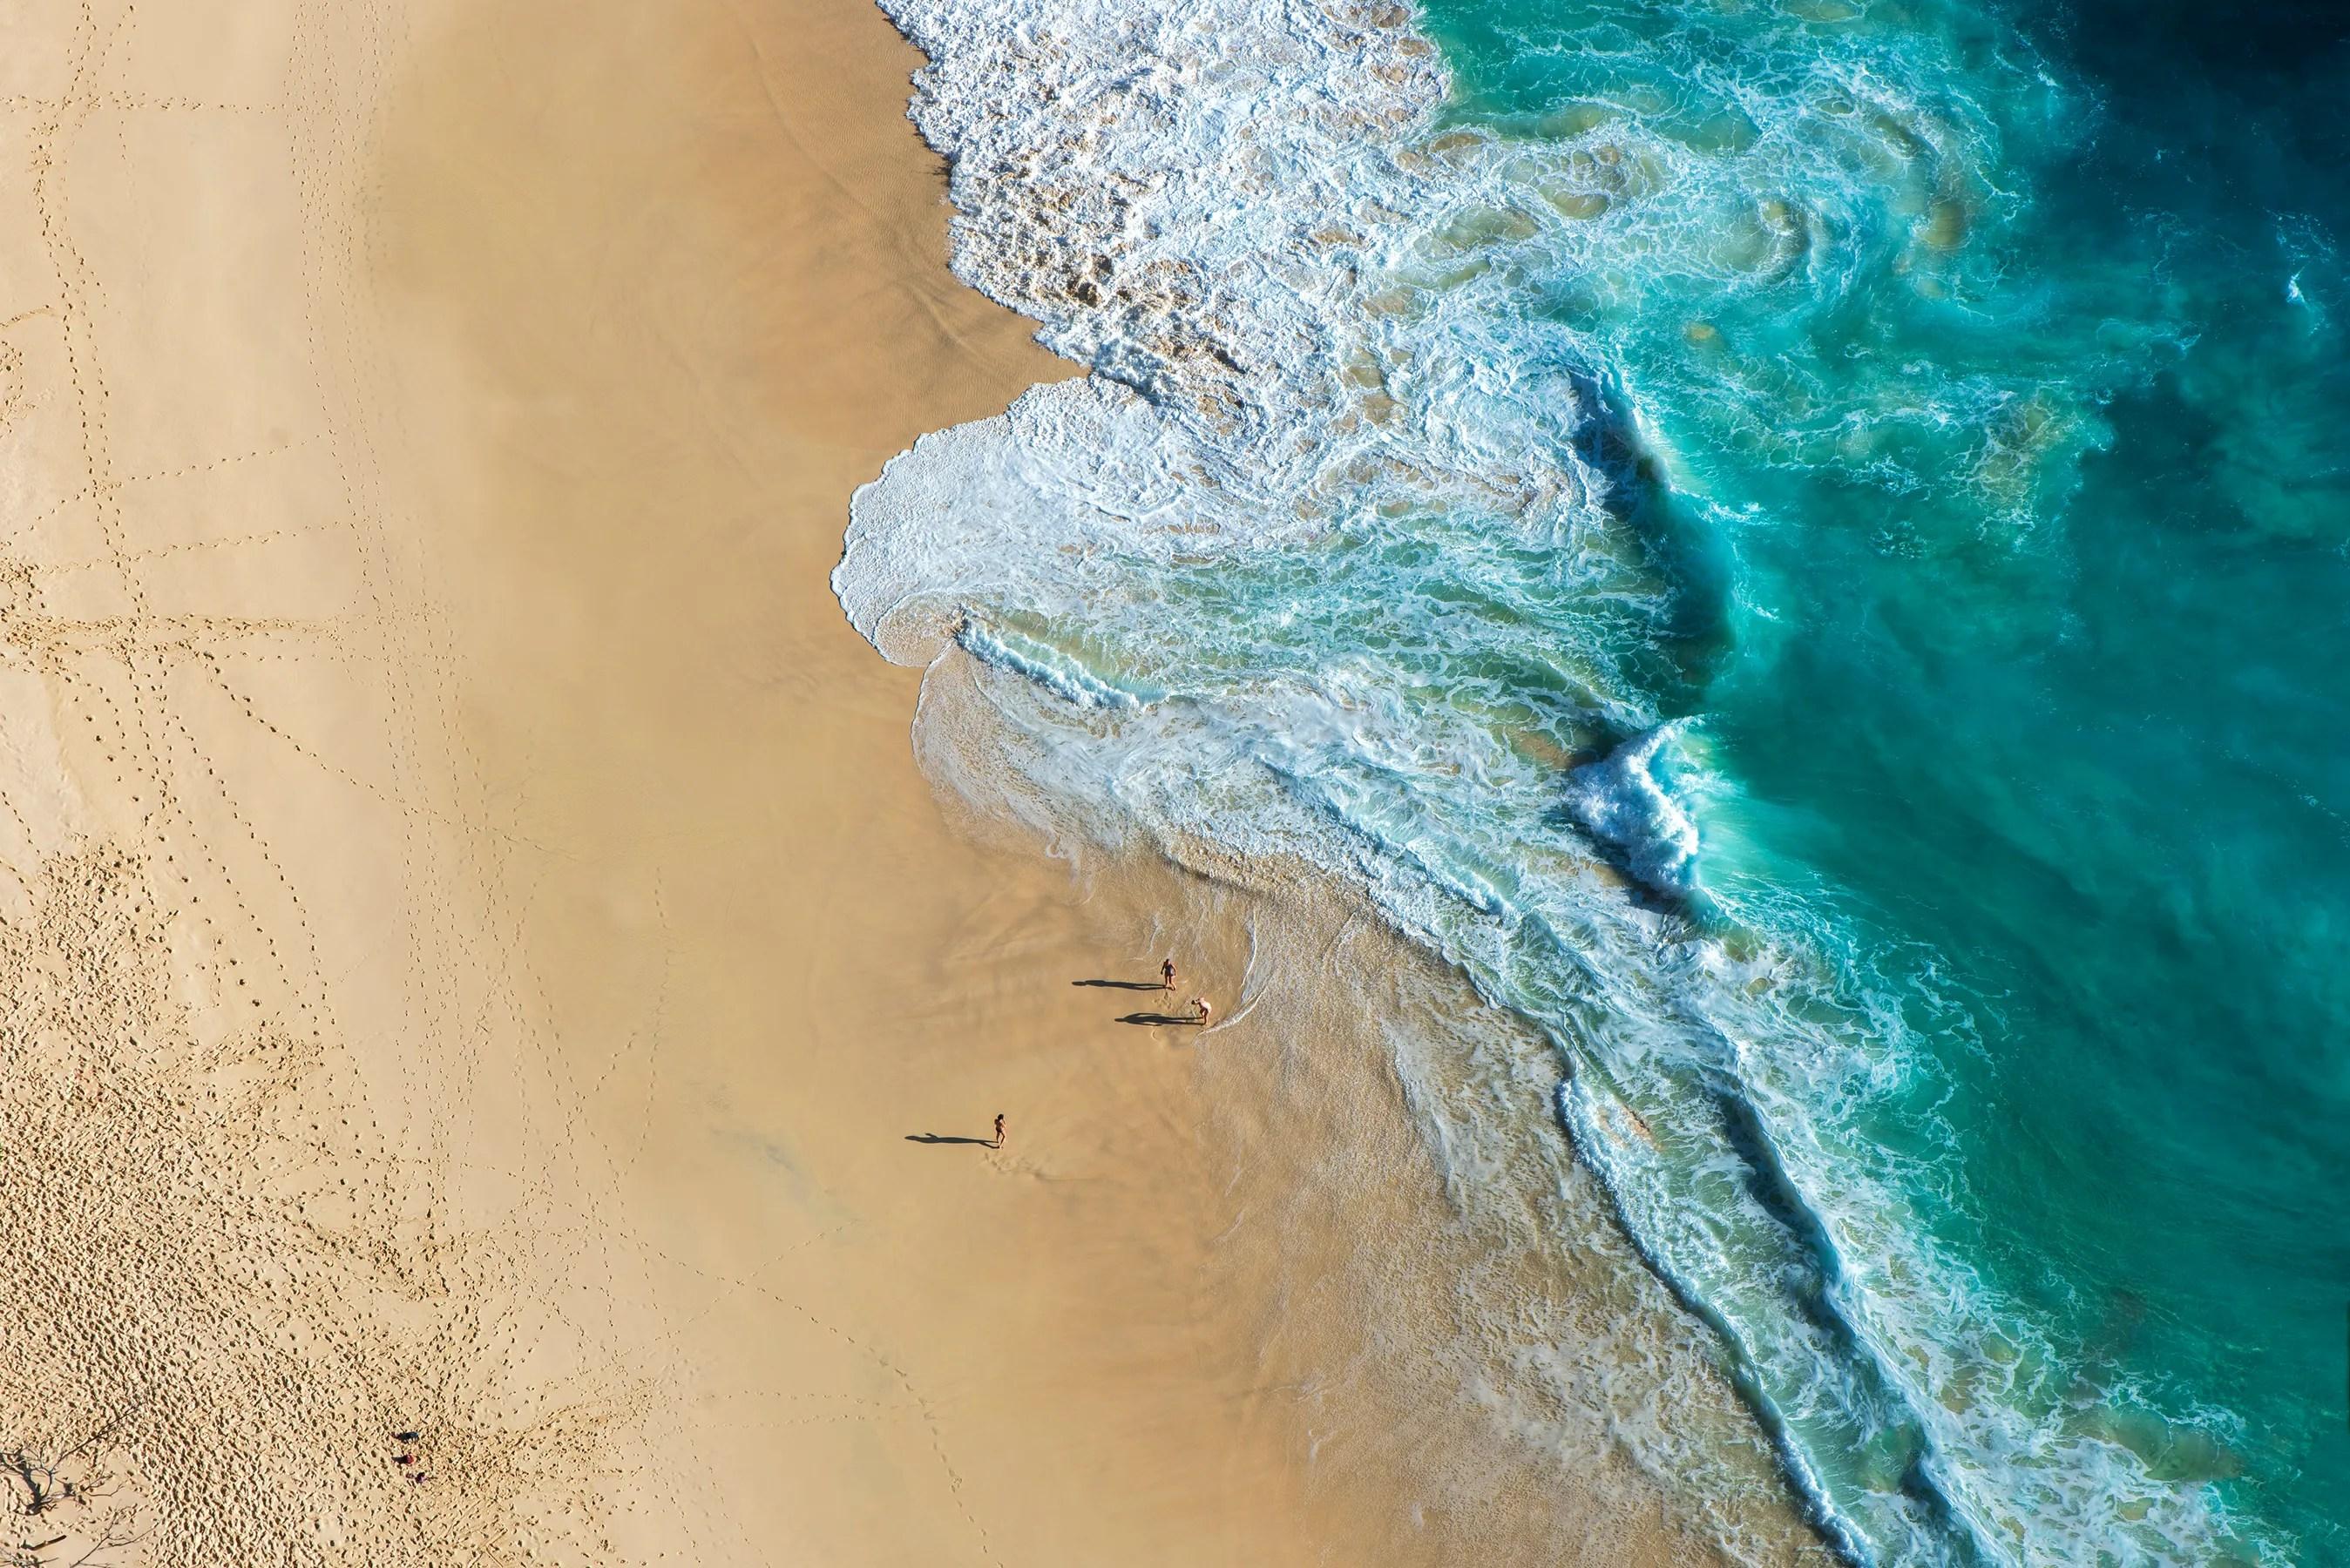 Missä Aasiassa mennä talvella merelle. Tropical Karang Dava Beach (Karang Dawa) Manta Bay Bay (Manta Bay), Bali, Indonesia